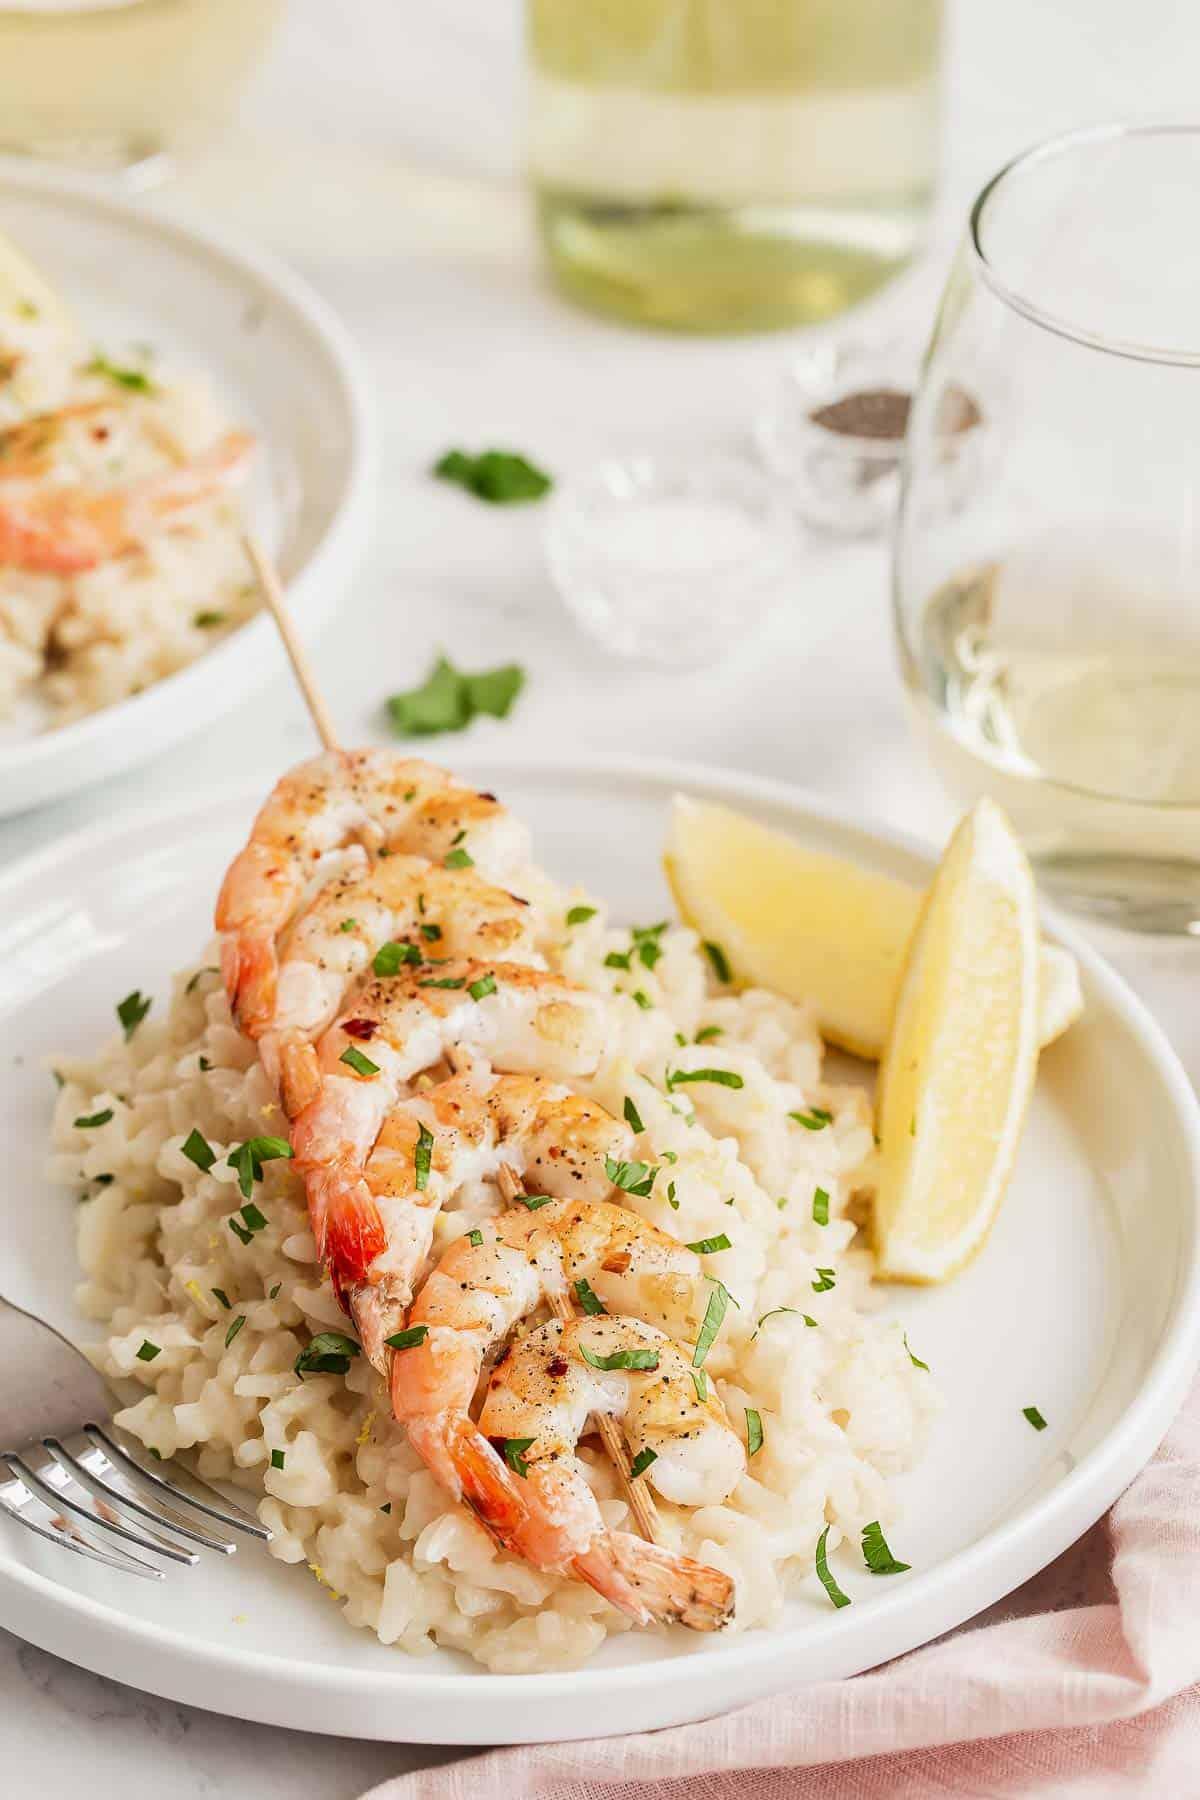 Shrimp on a skewer over risotto with lemon wedges.